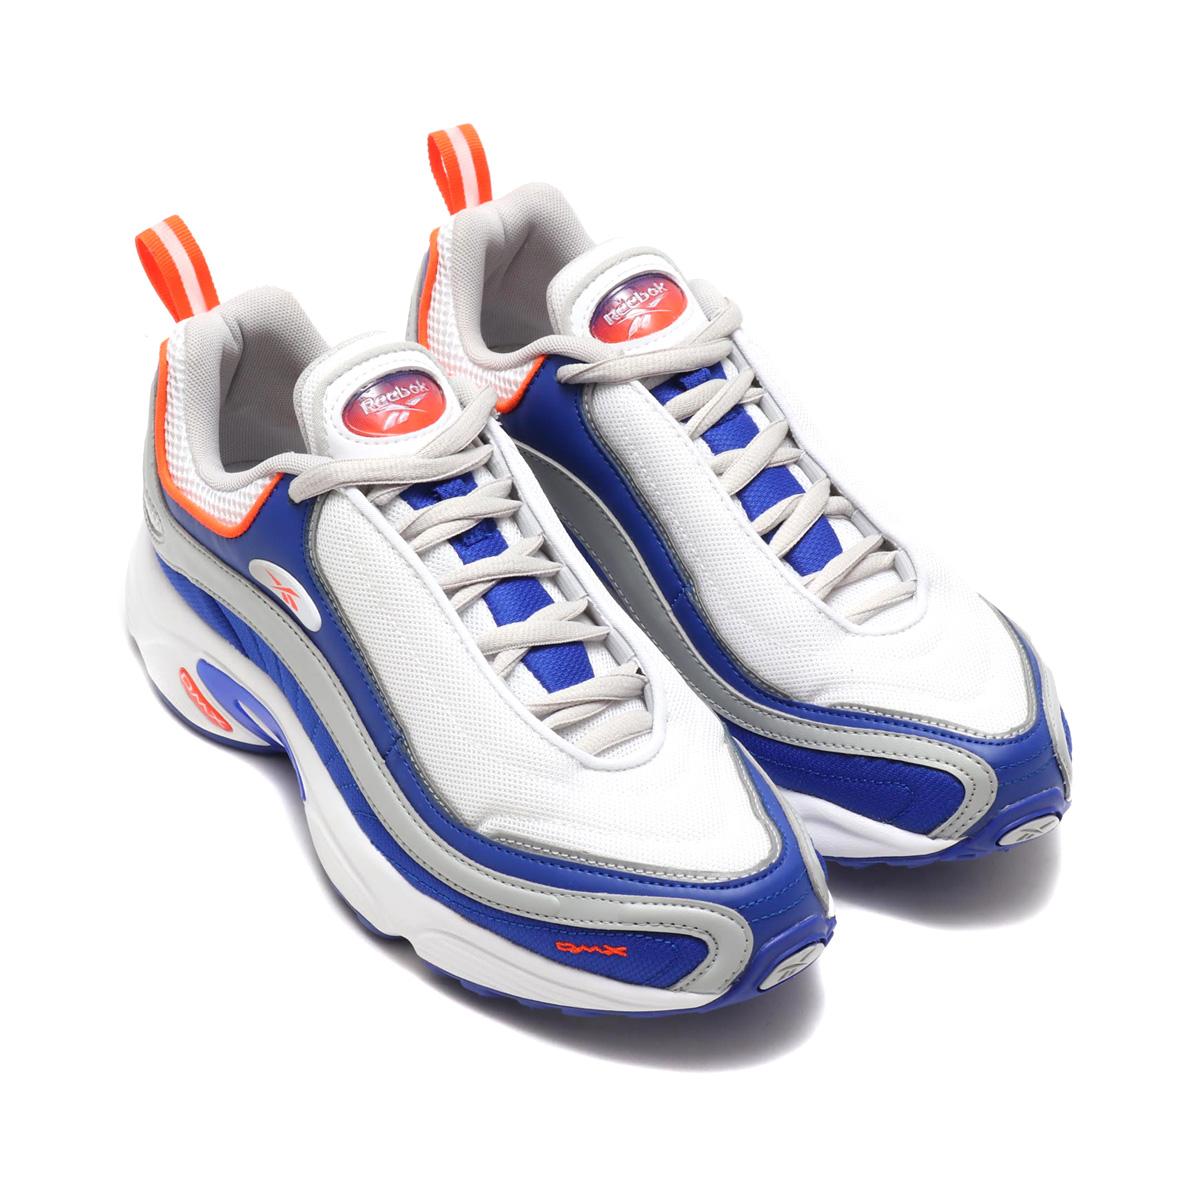 Reebok DAYTONA DMX SC(リーボック デイトナ DMX SC)WHITE/BLUE MOVE/SKULL GRAY/BRIGHT LAVA【メンズ スニーカー】18FW-I